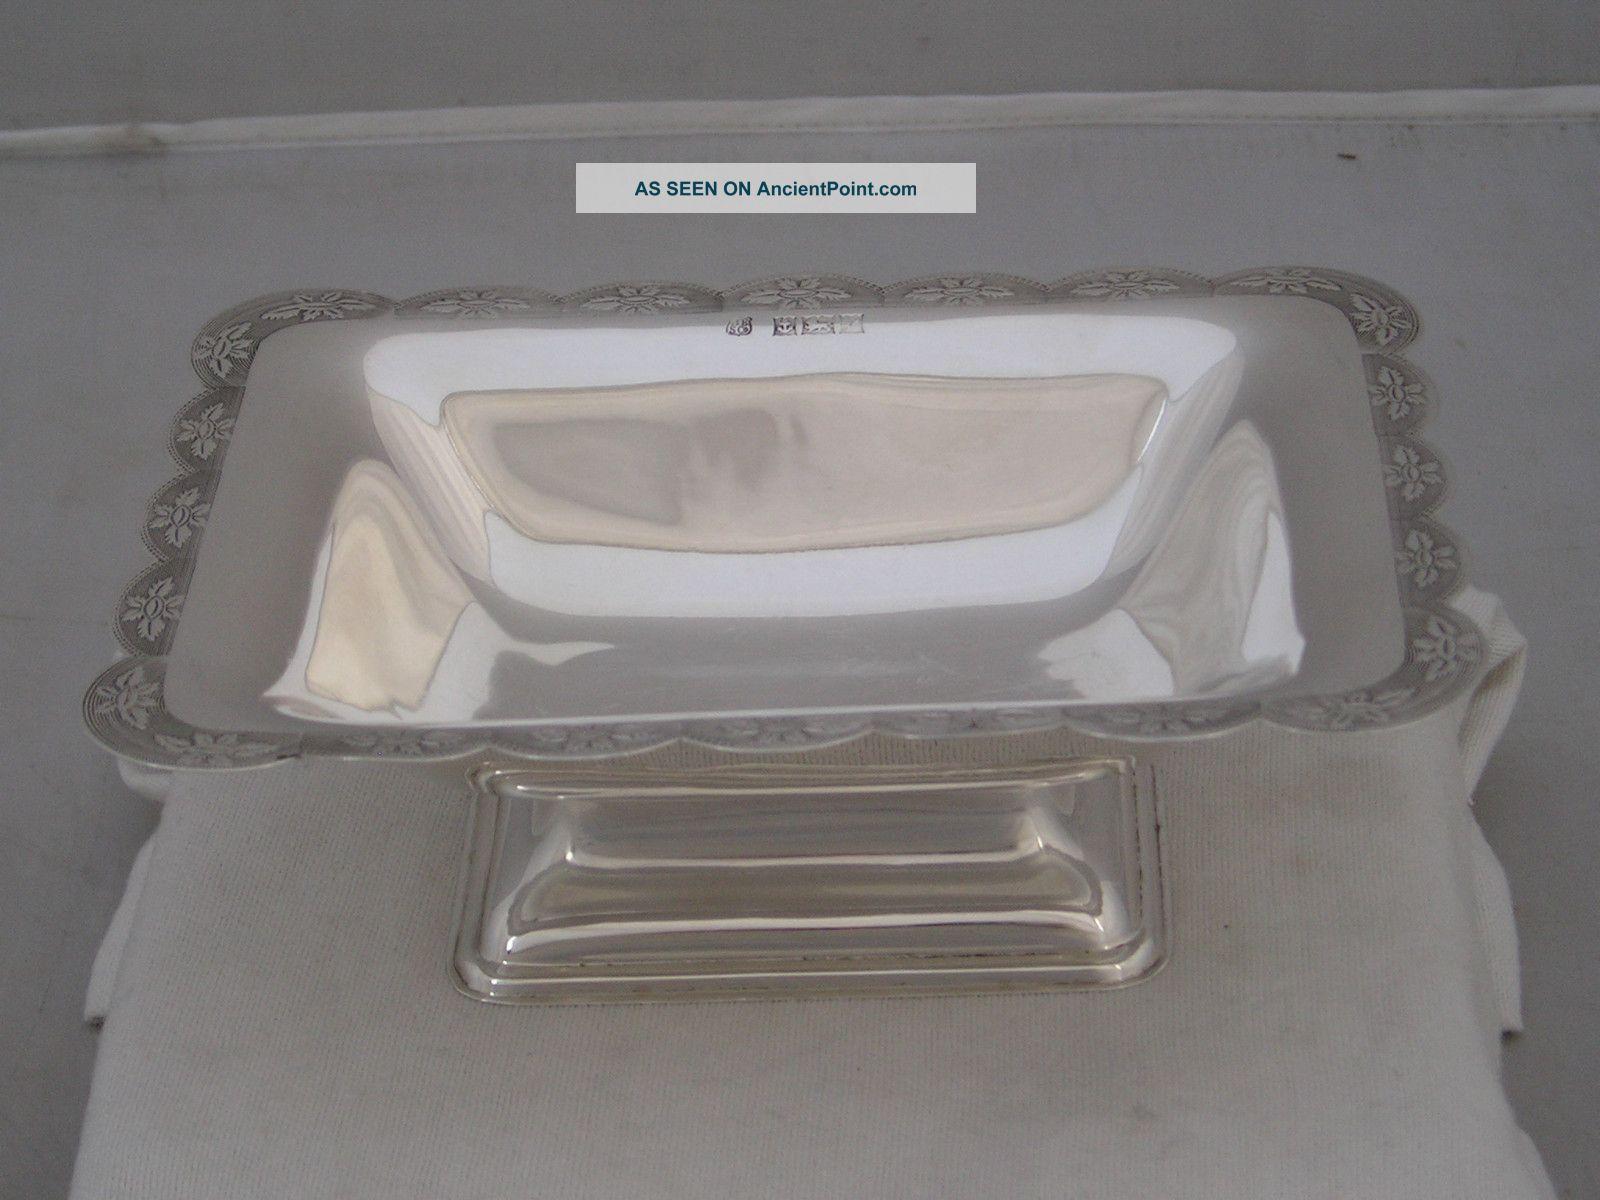 Lovely Elizabeth Ii 1970 Hallmarked Silver Oblong Dish 160g Bowls photo